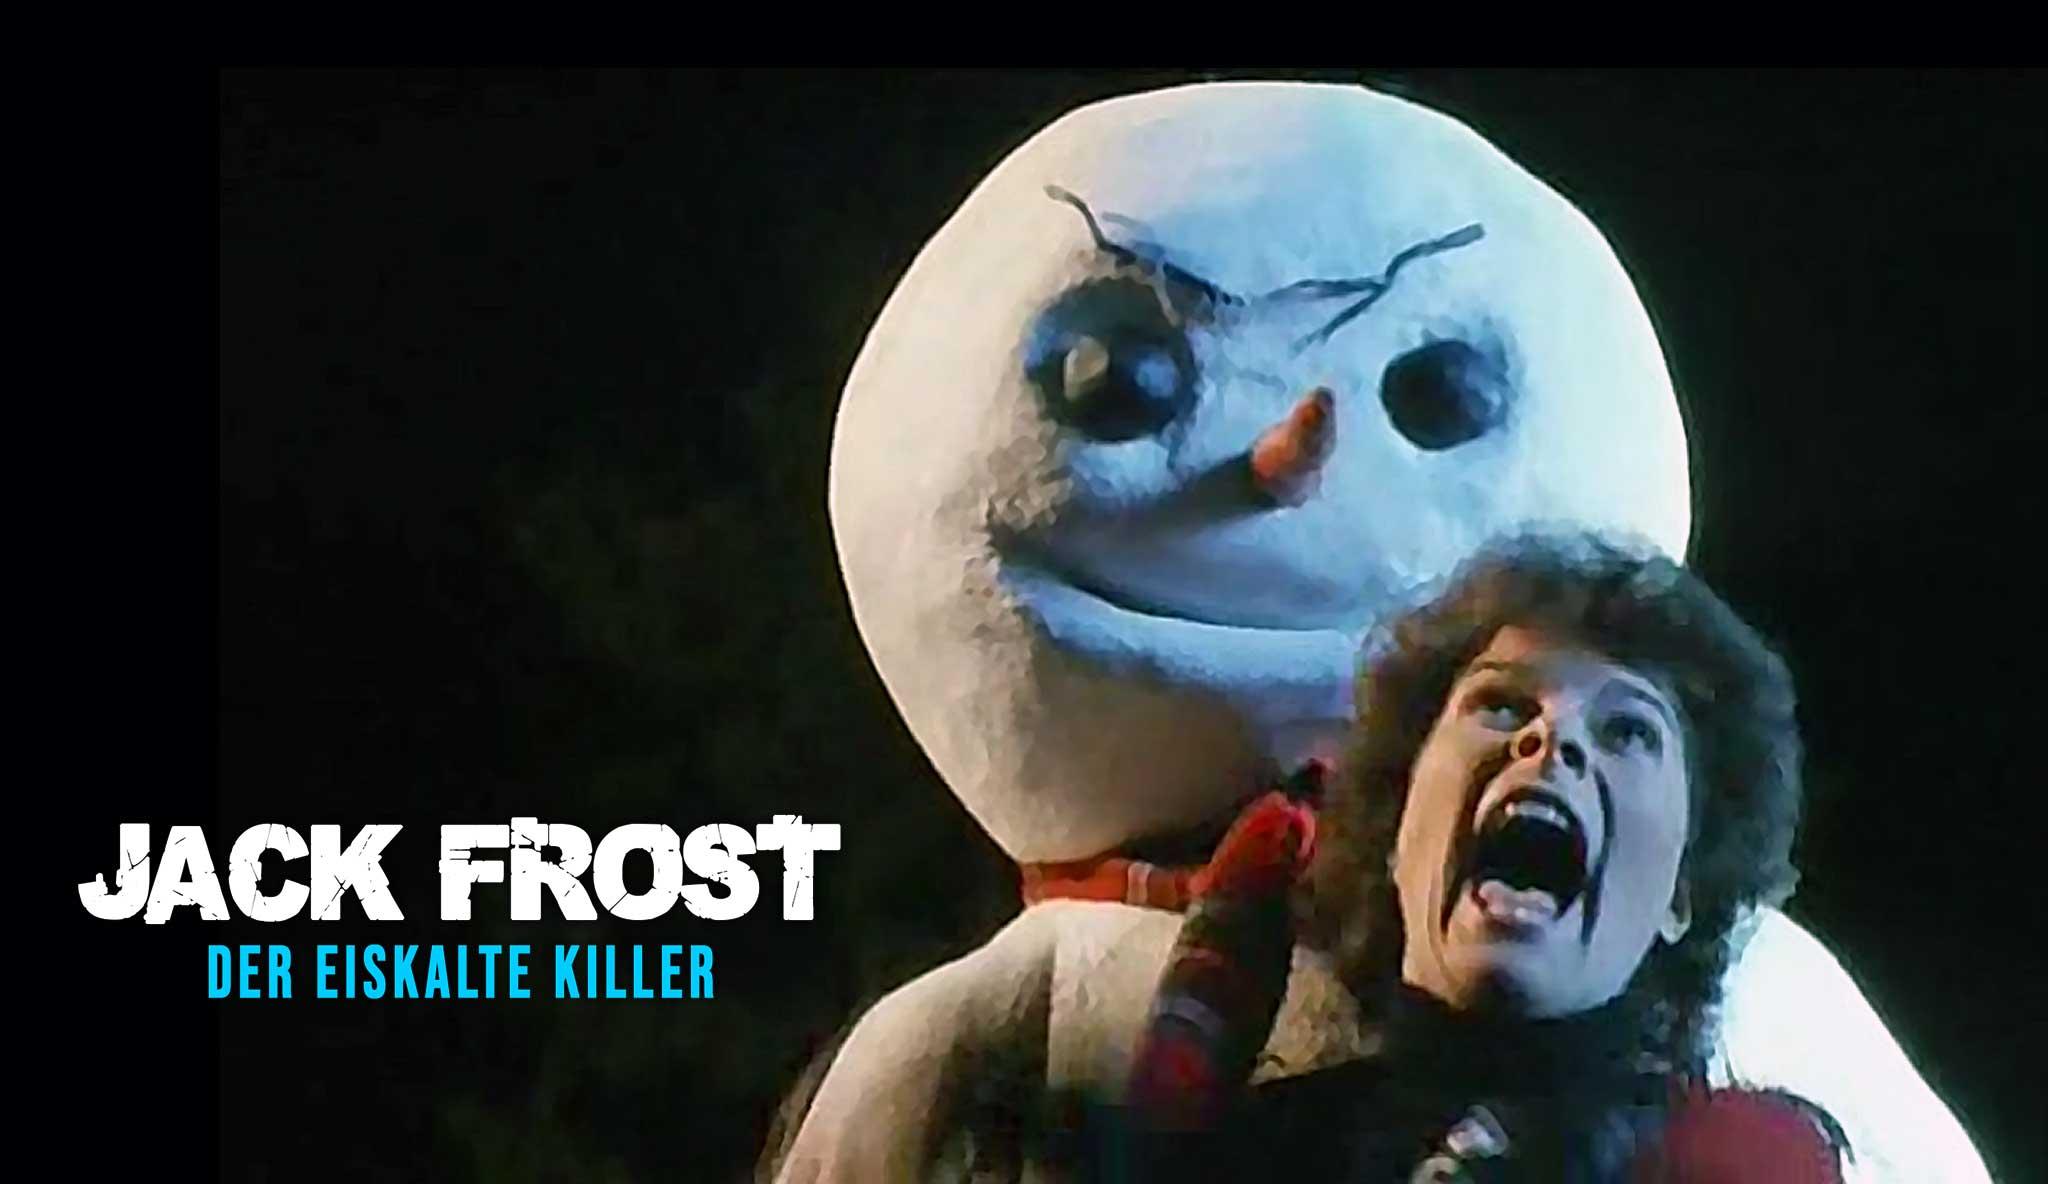 jack-frost-der-eiskalte-killer\header.jpg